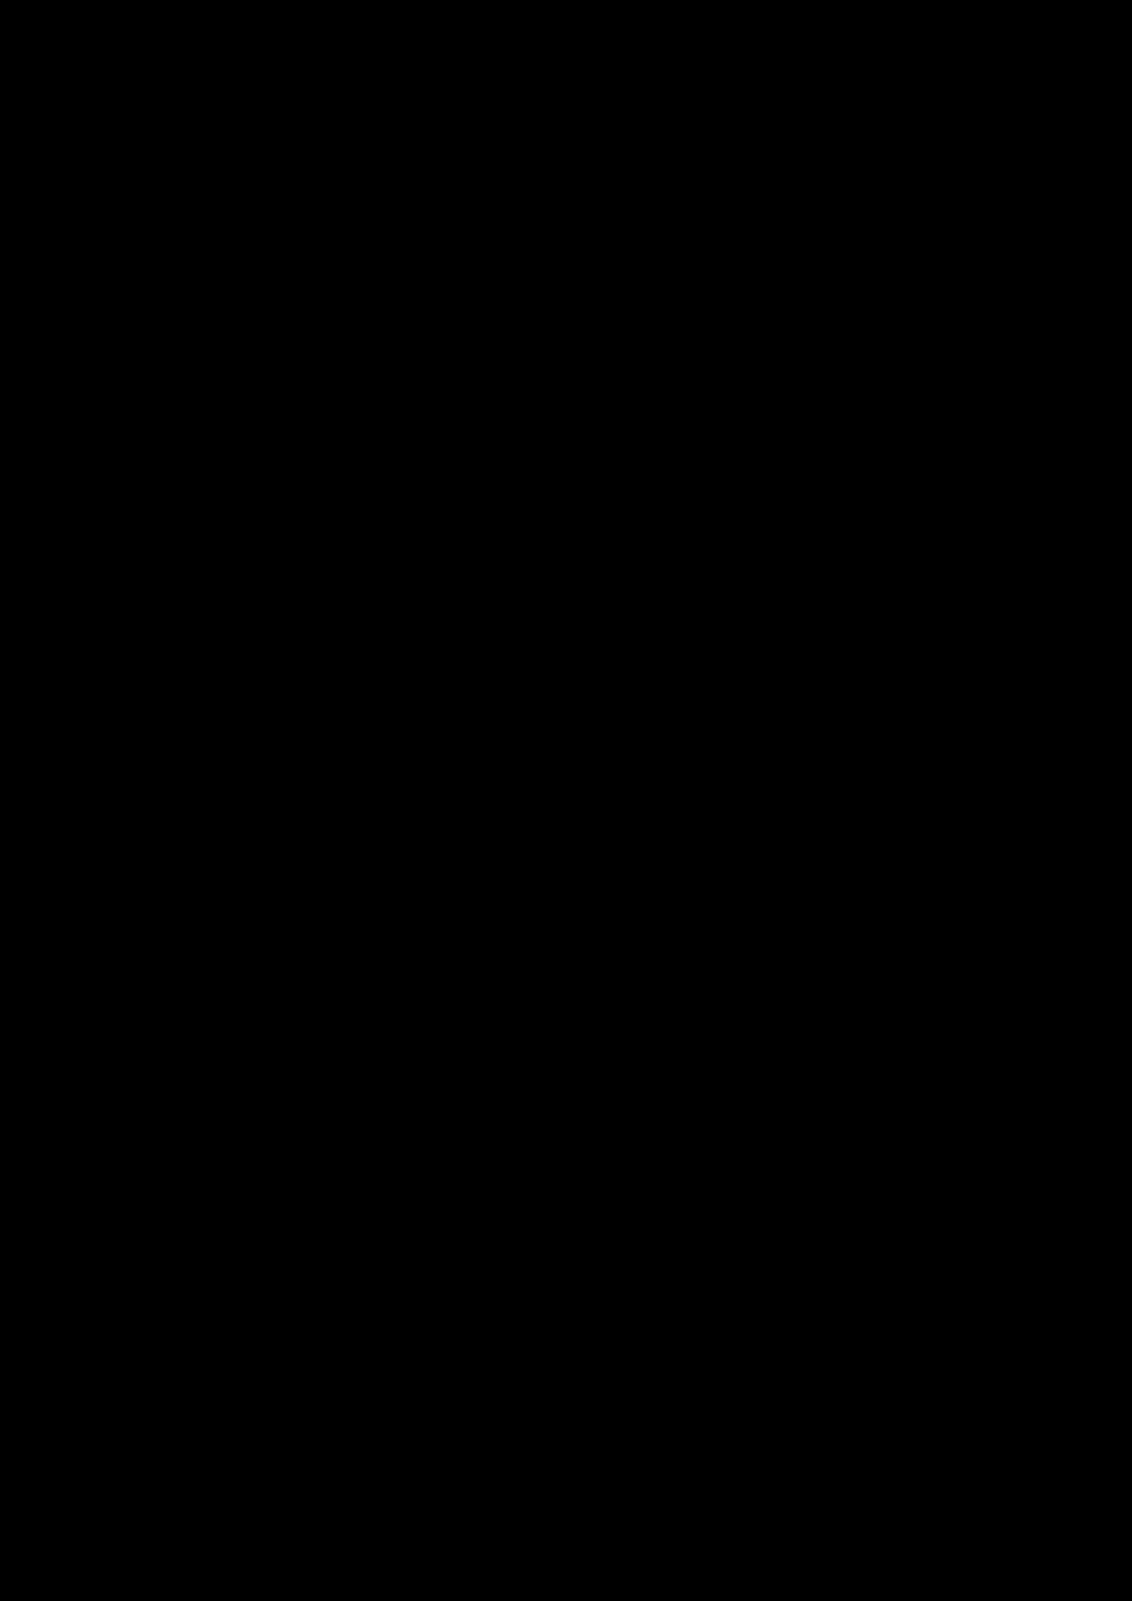 Ten lyubvi slide, Image 21